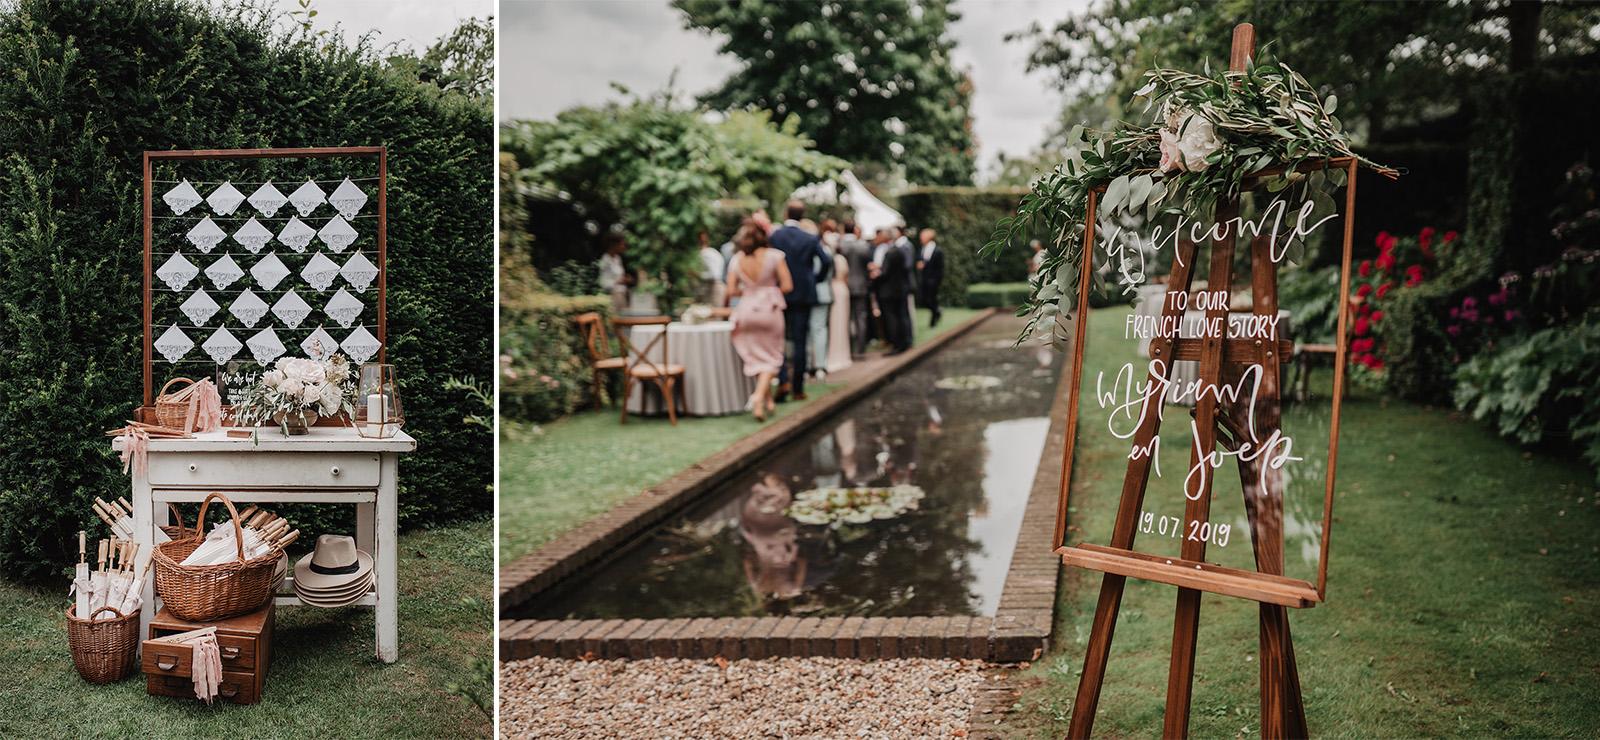 Tips successful wedding